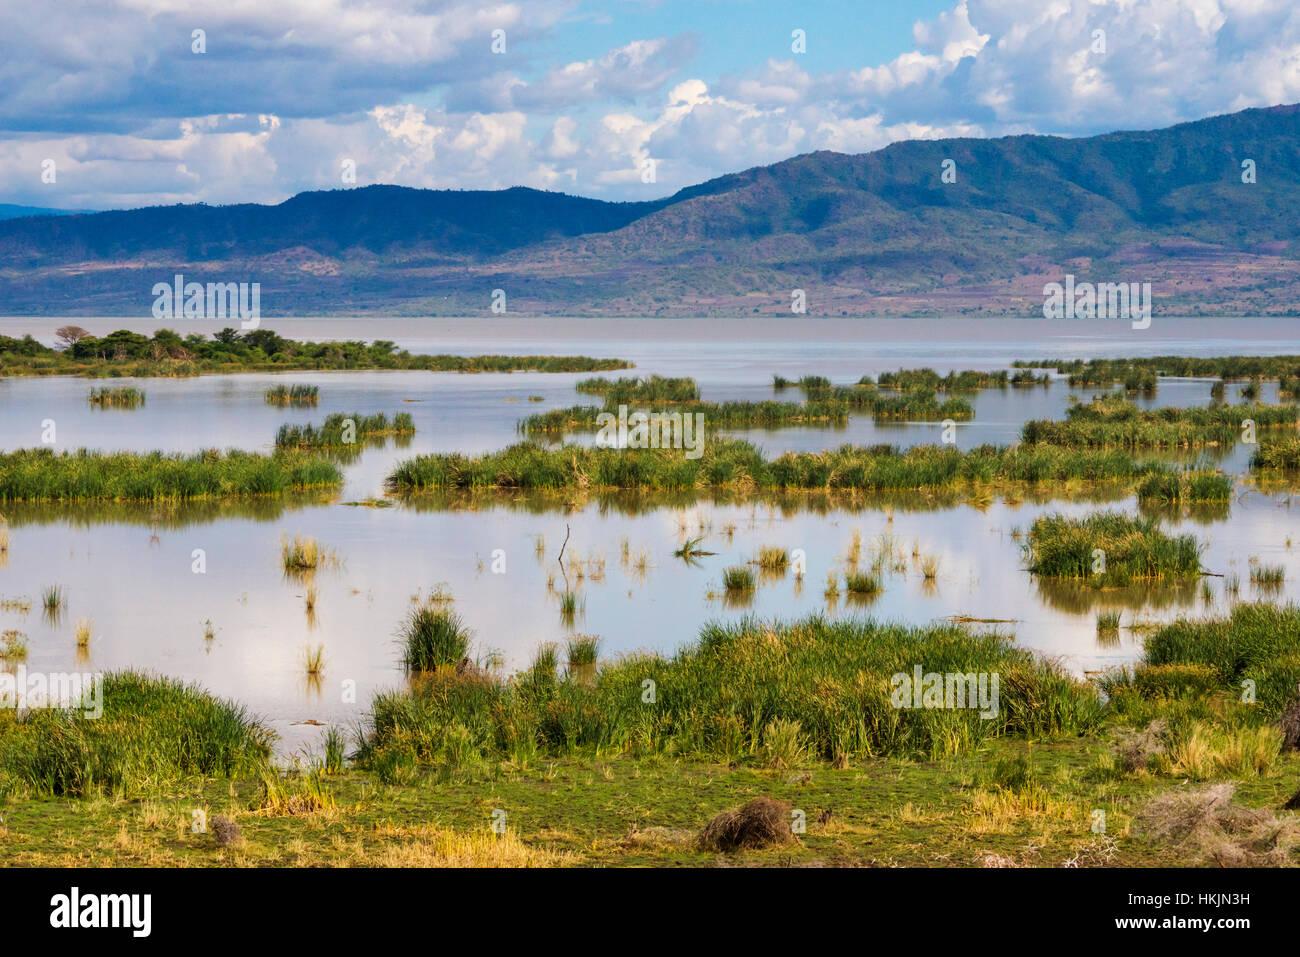 Lake Chamo, Ethiopia - Stock Image